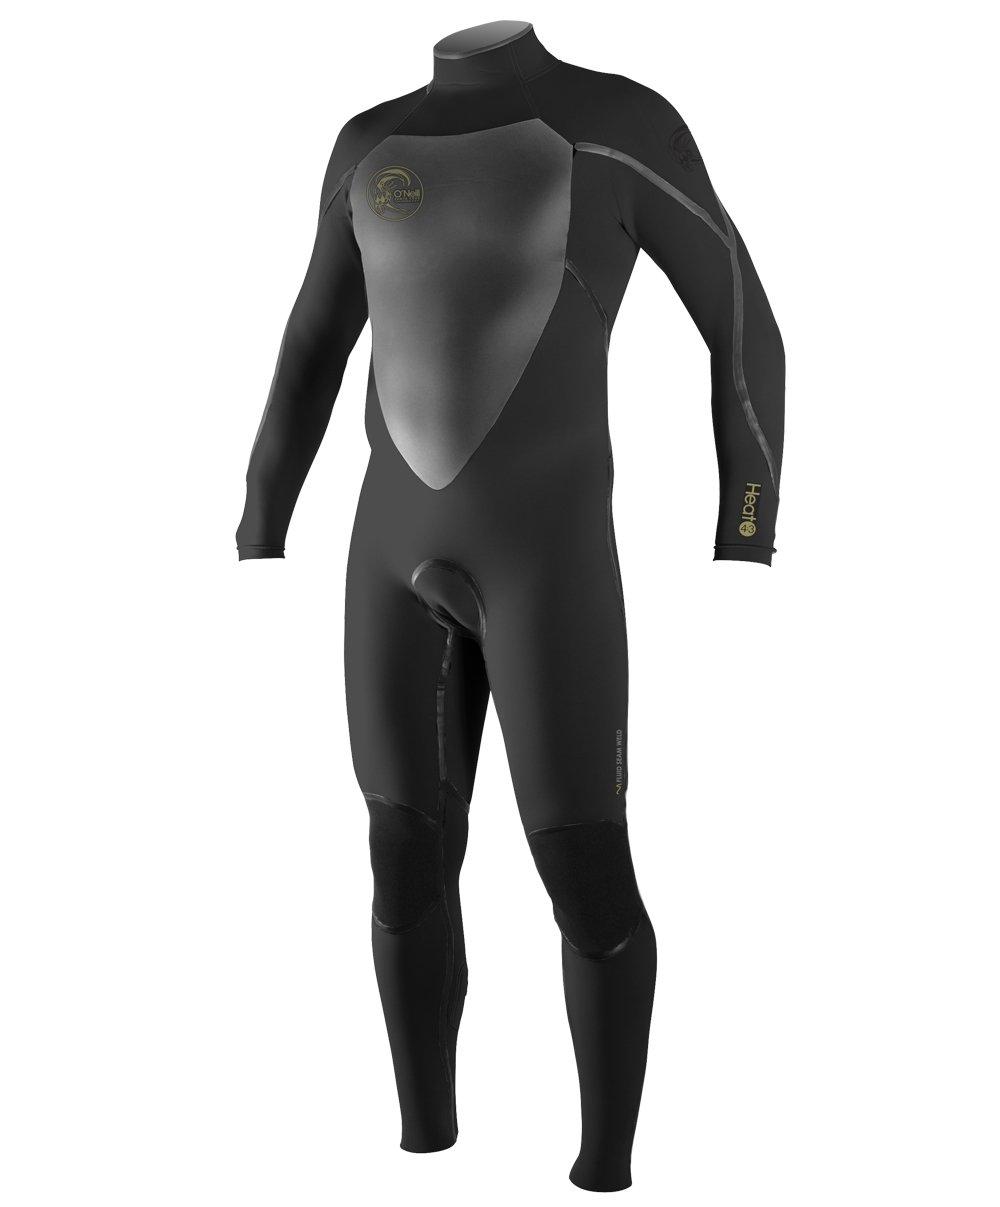 O'Neill Men's Heat 4/3mm Back Zip Full Wetsuit, Black, Small